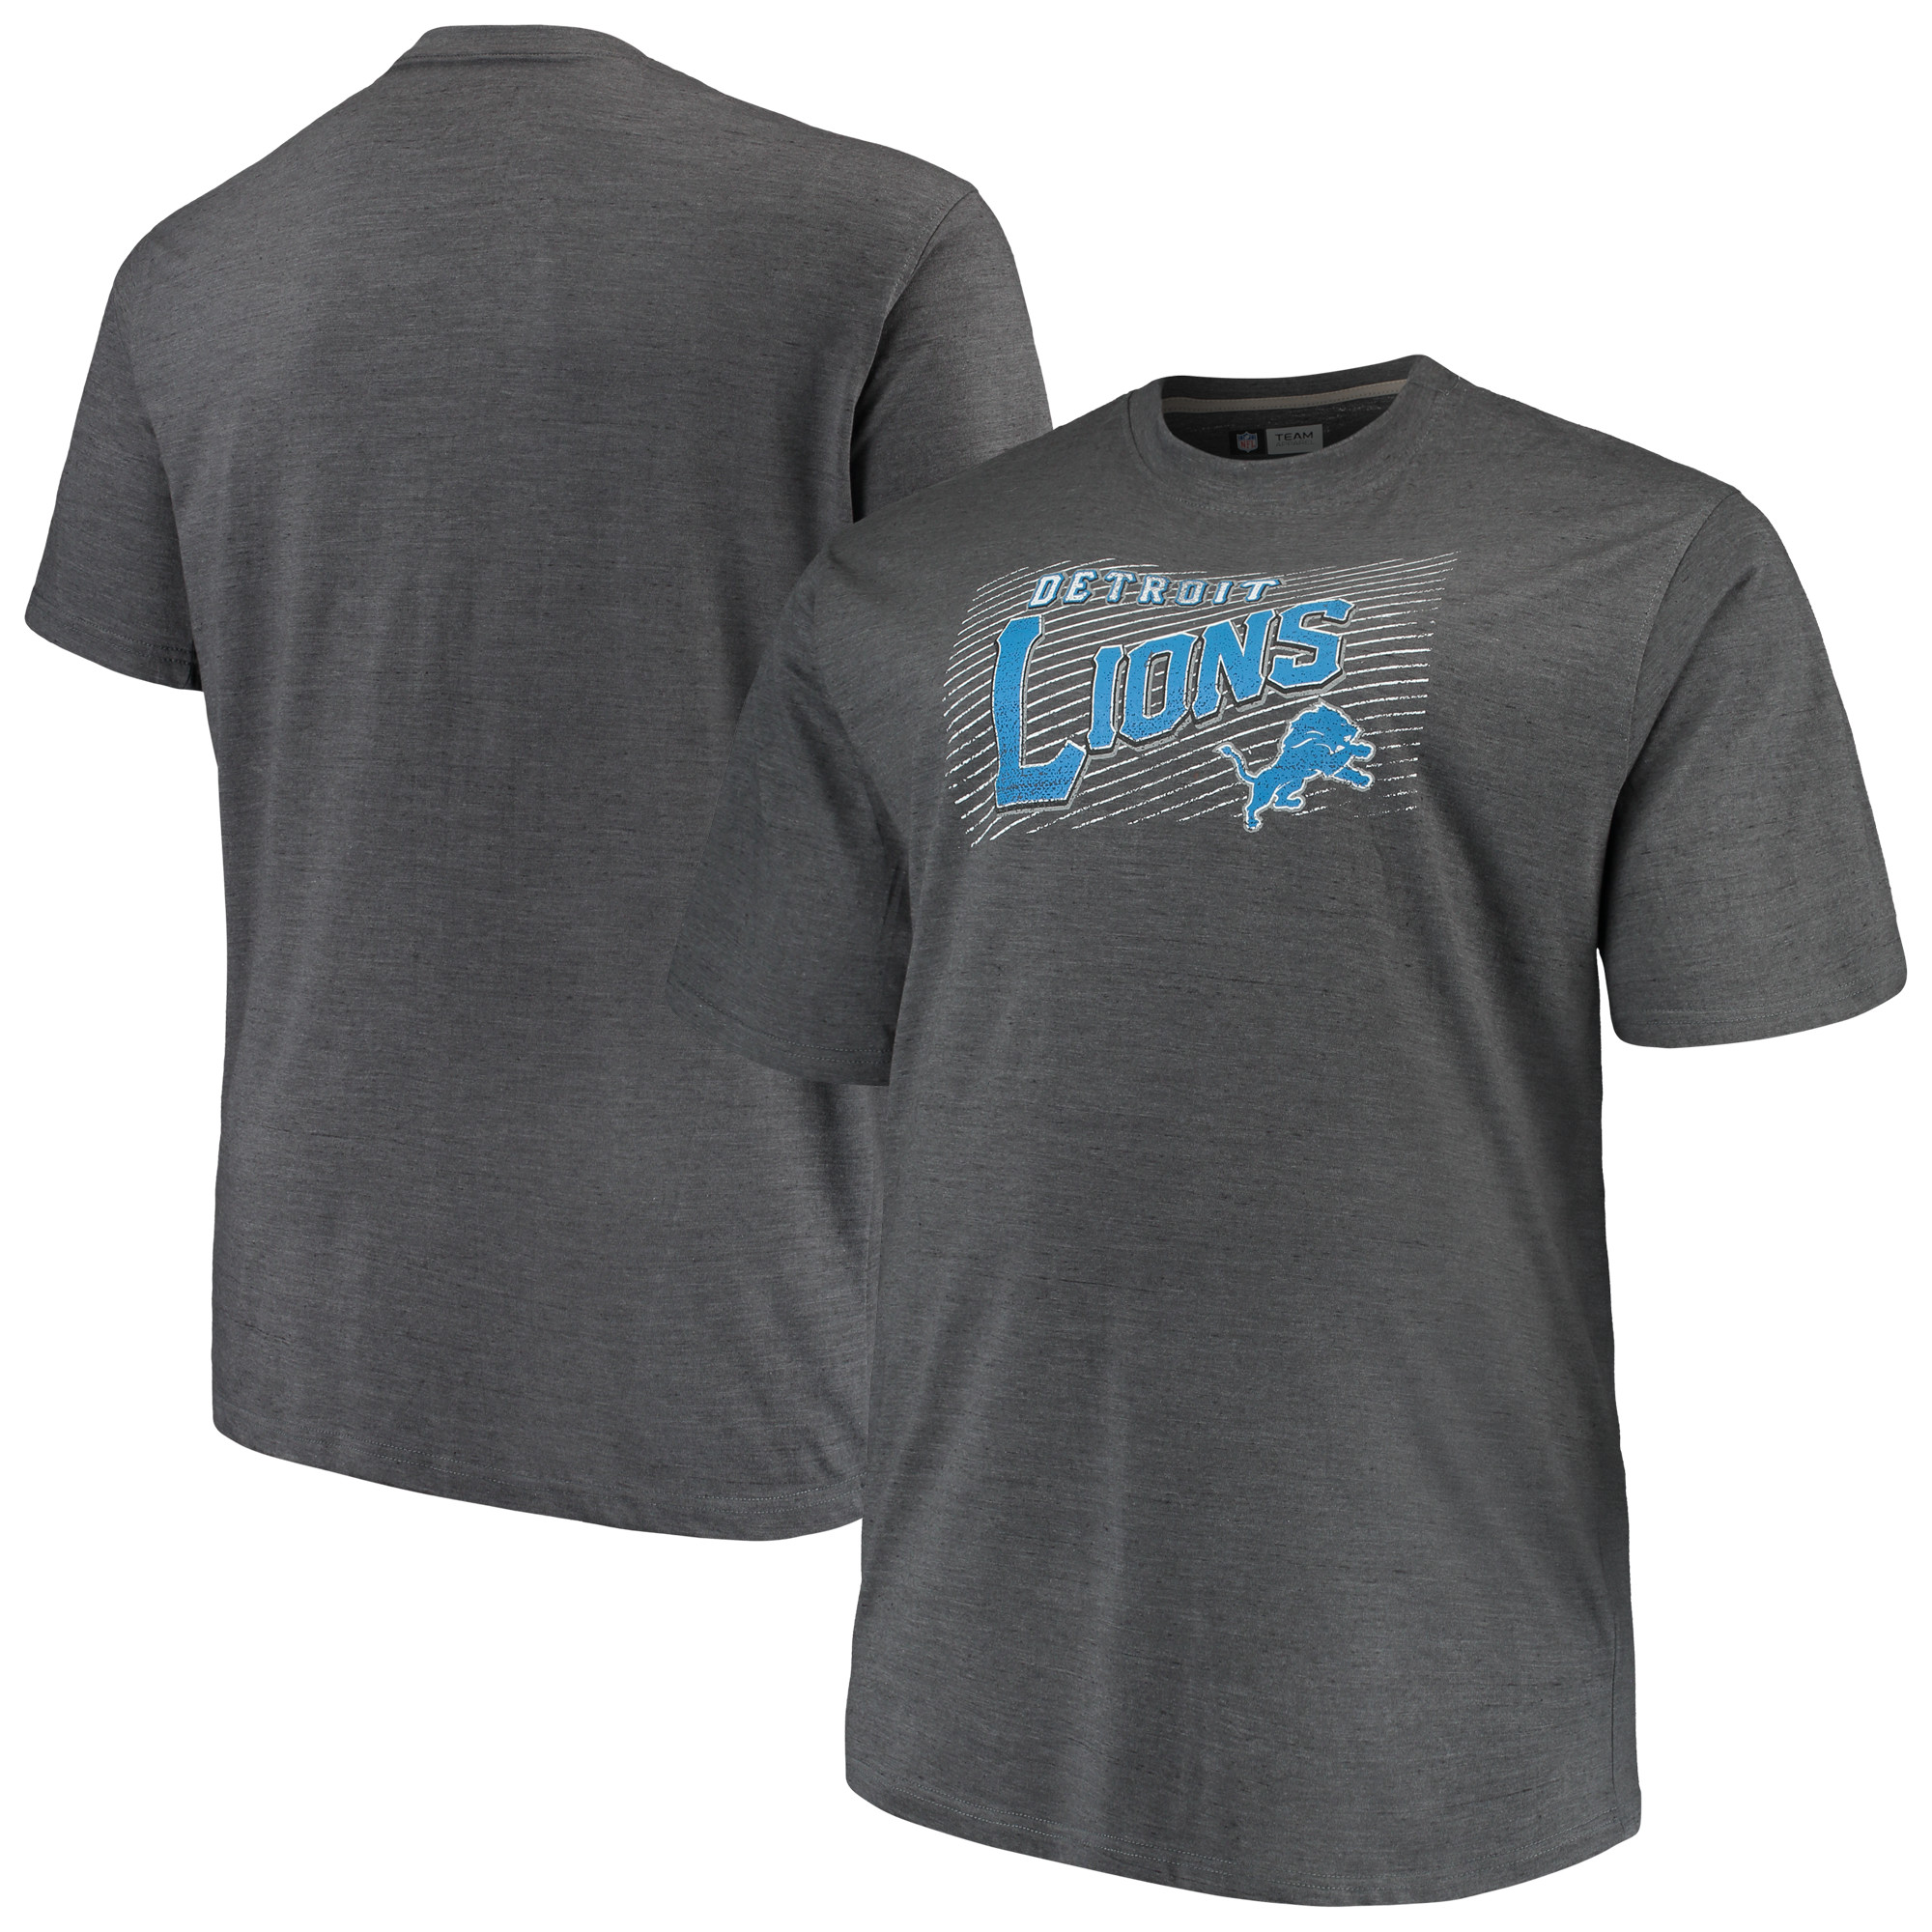 Men's Majestic Charcoal Detroit Lions Big & Tall Royal Domination Malt T-Shirt